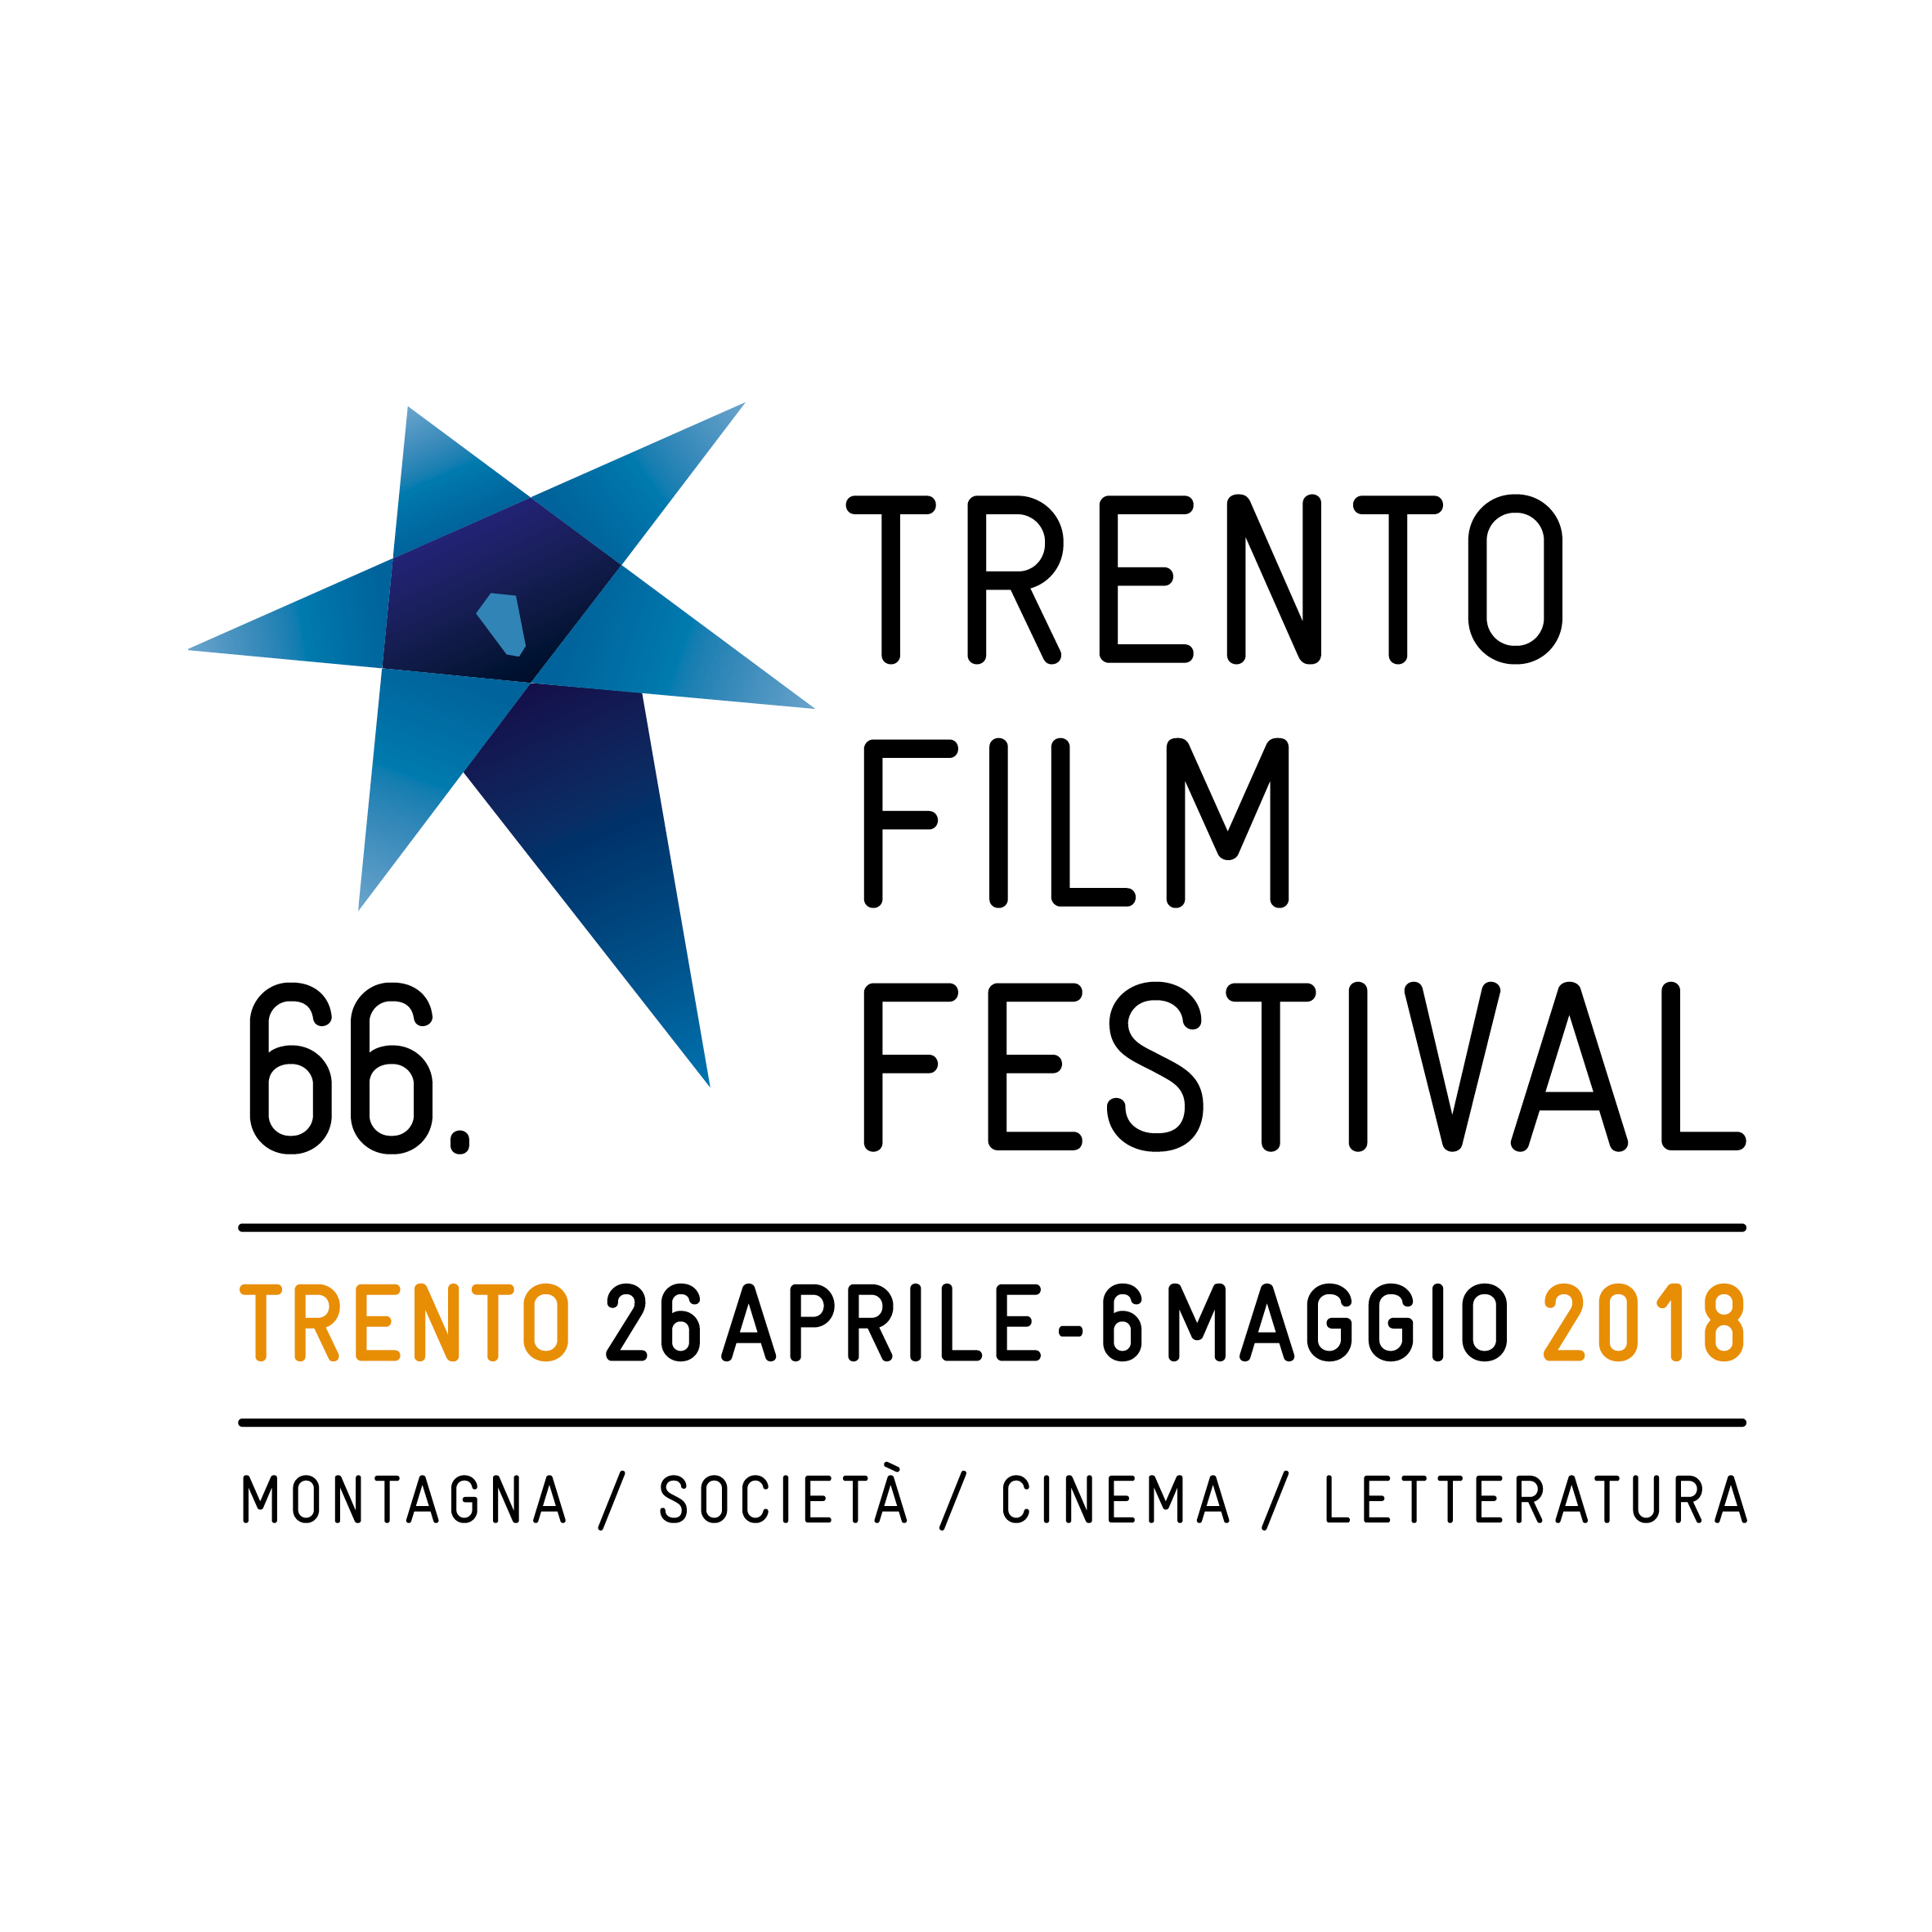 Trento Film Festival 2018